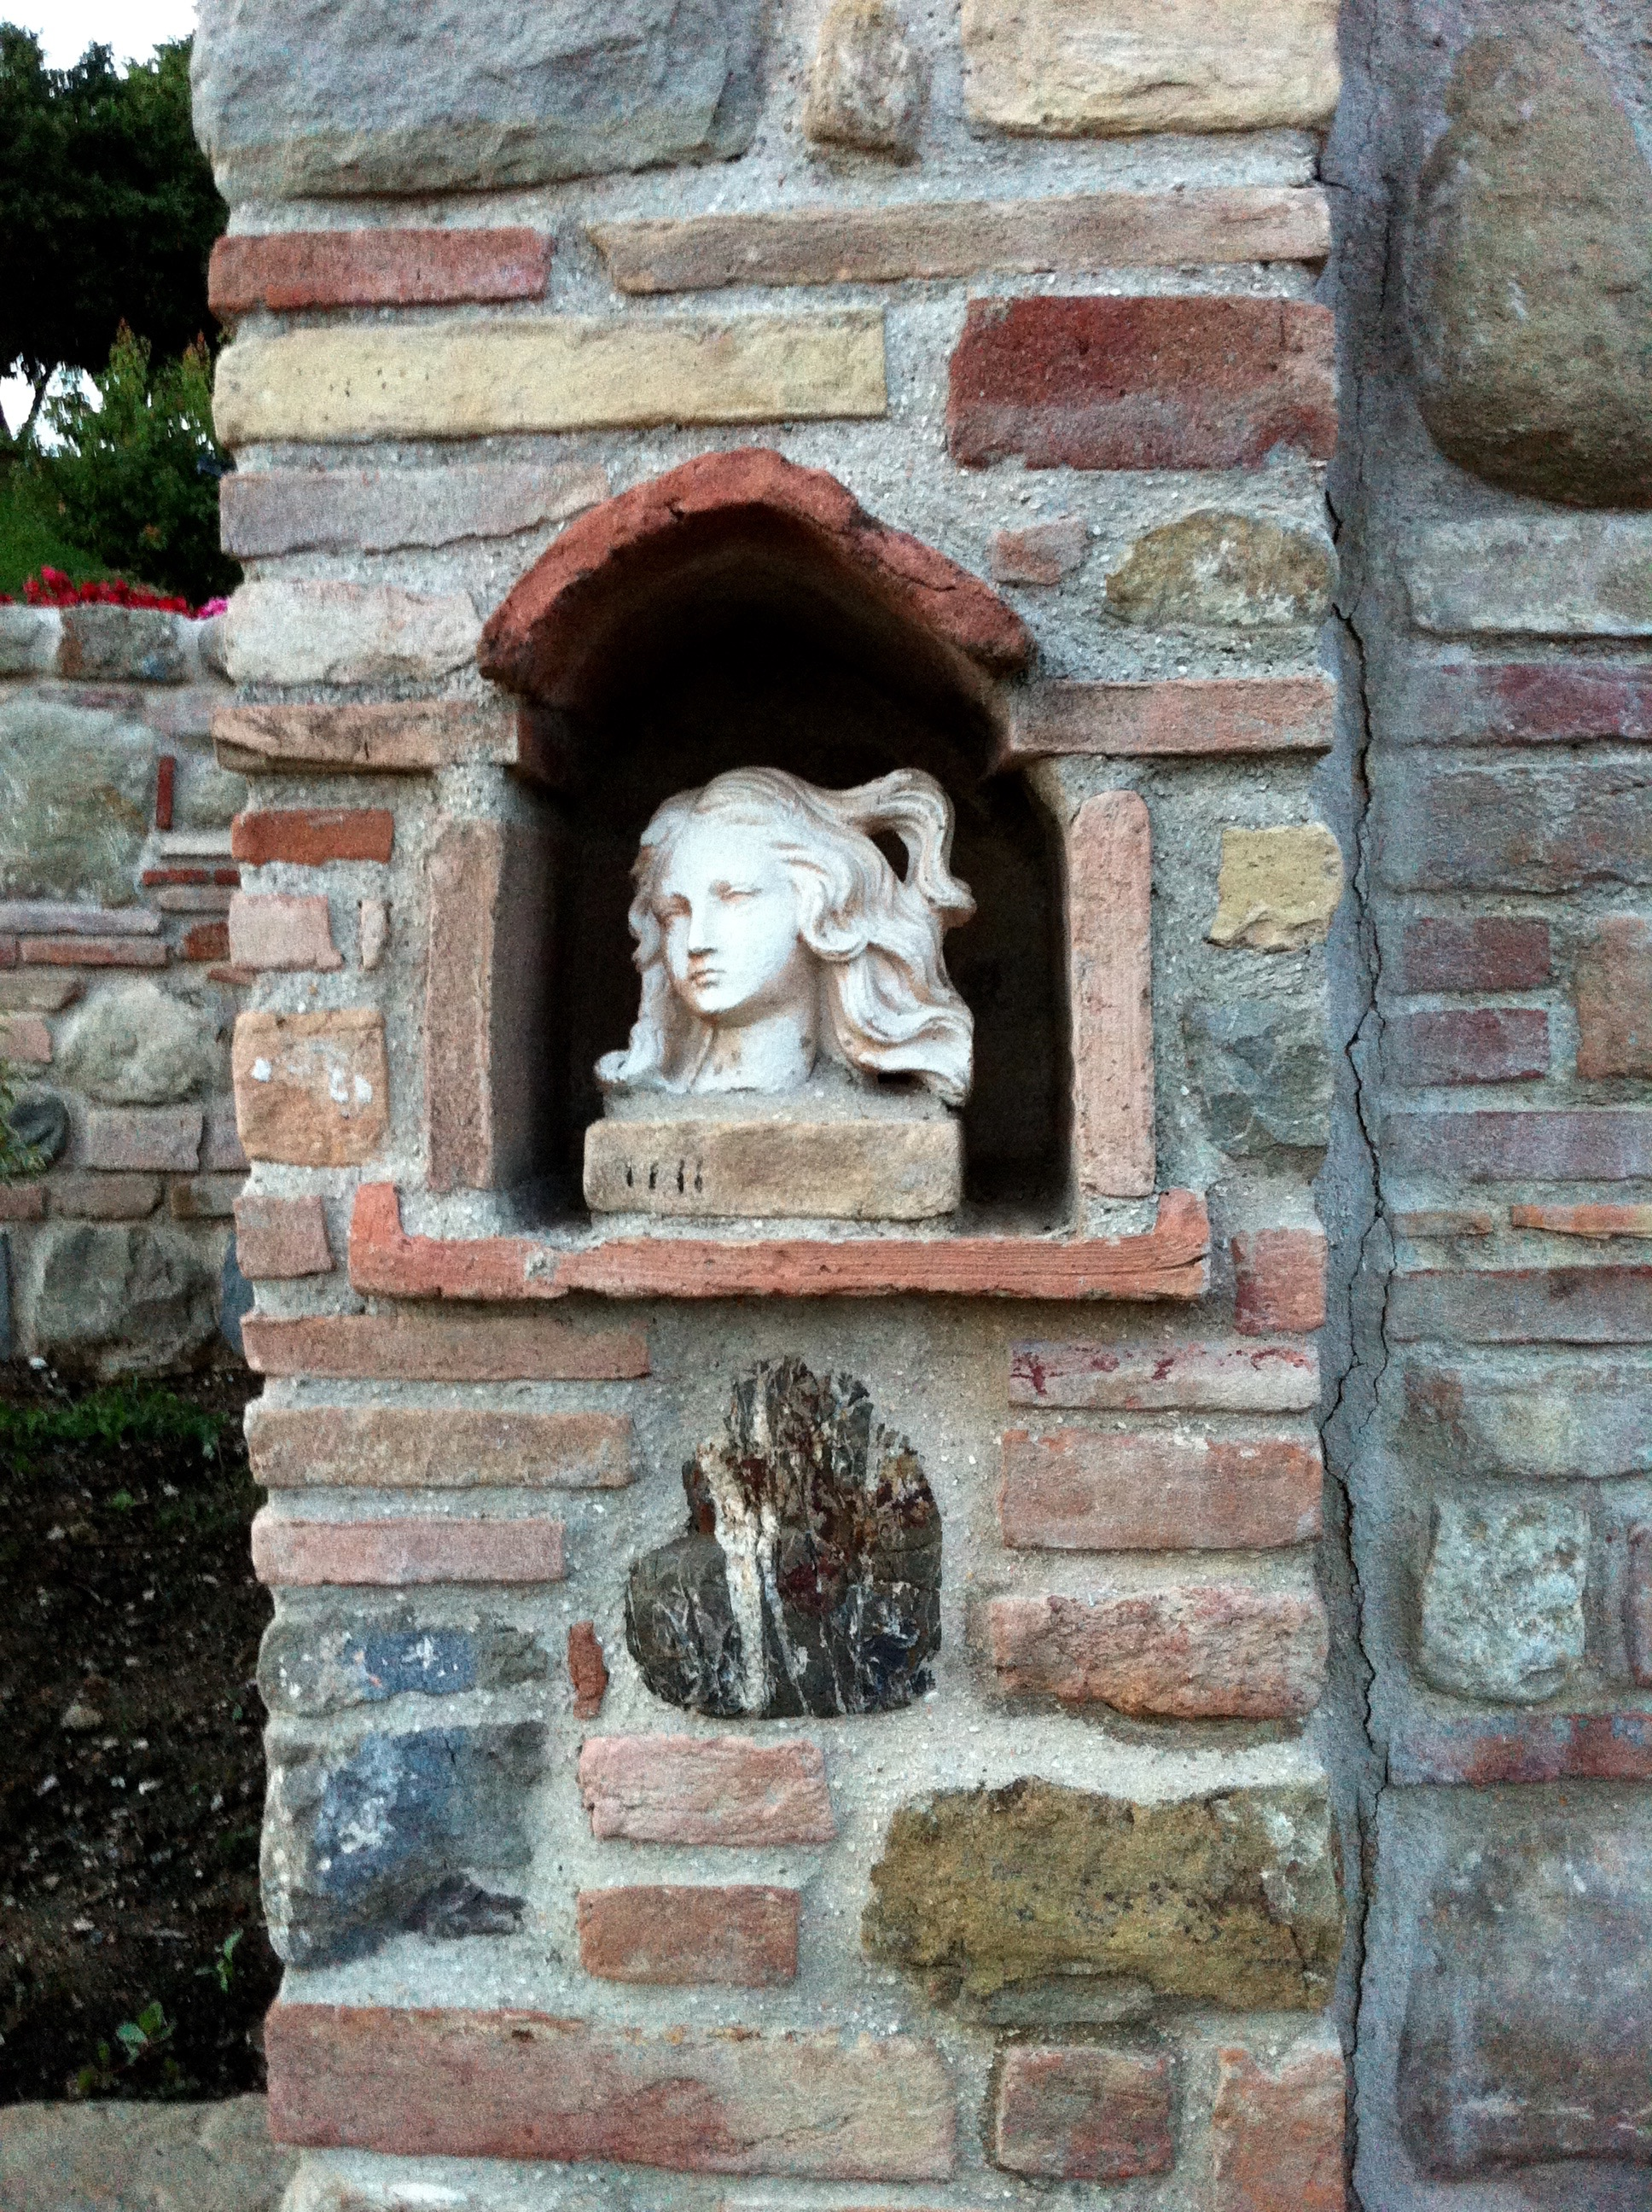 stone-wall-bust-girl-alcove.jpg